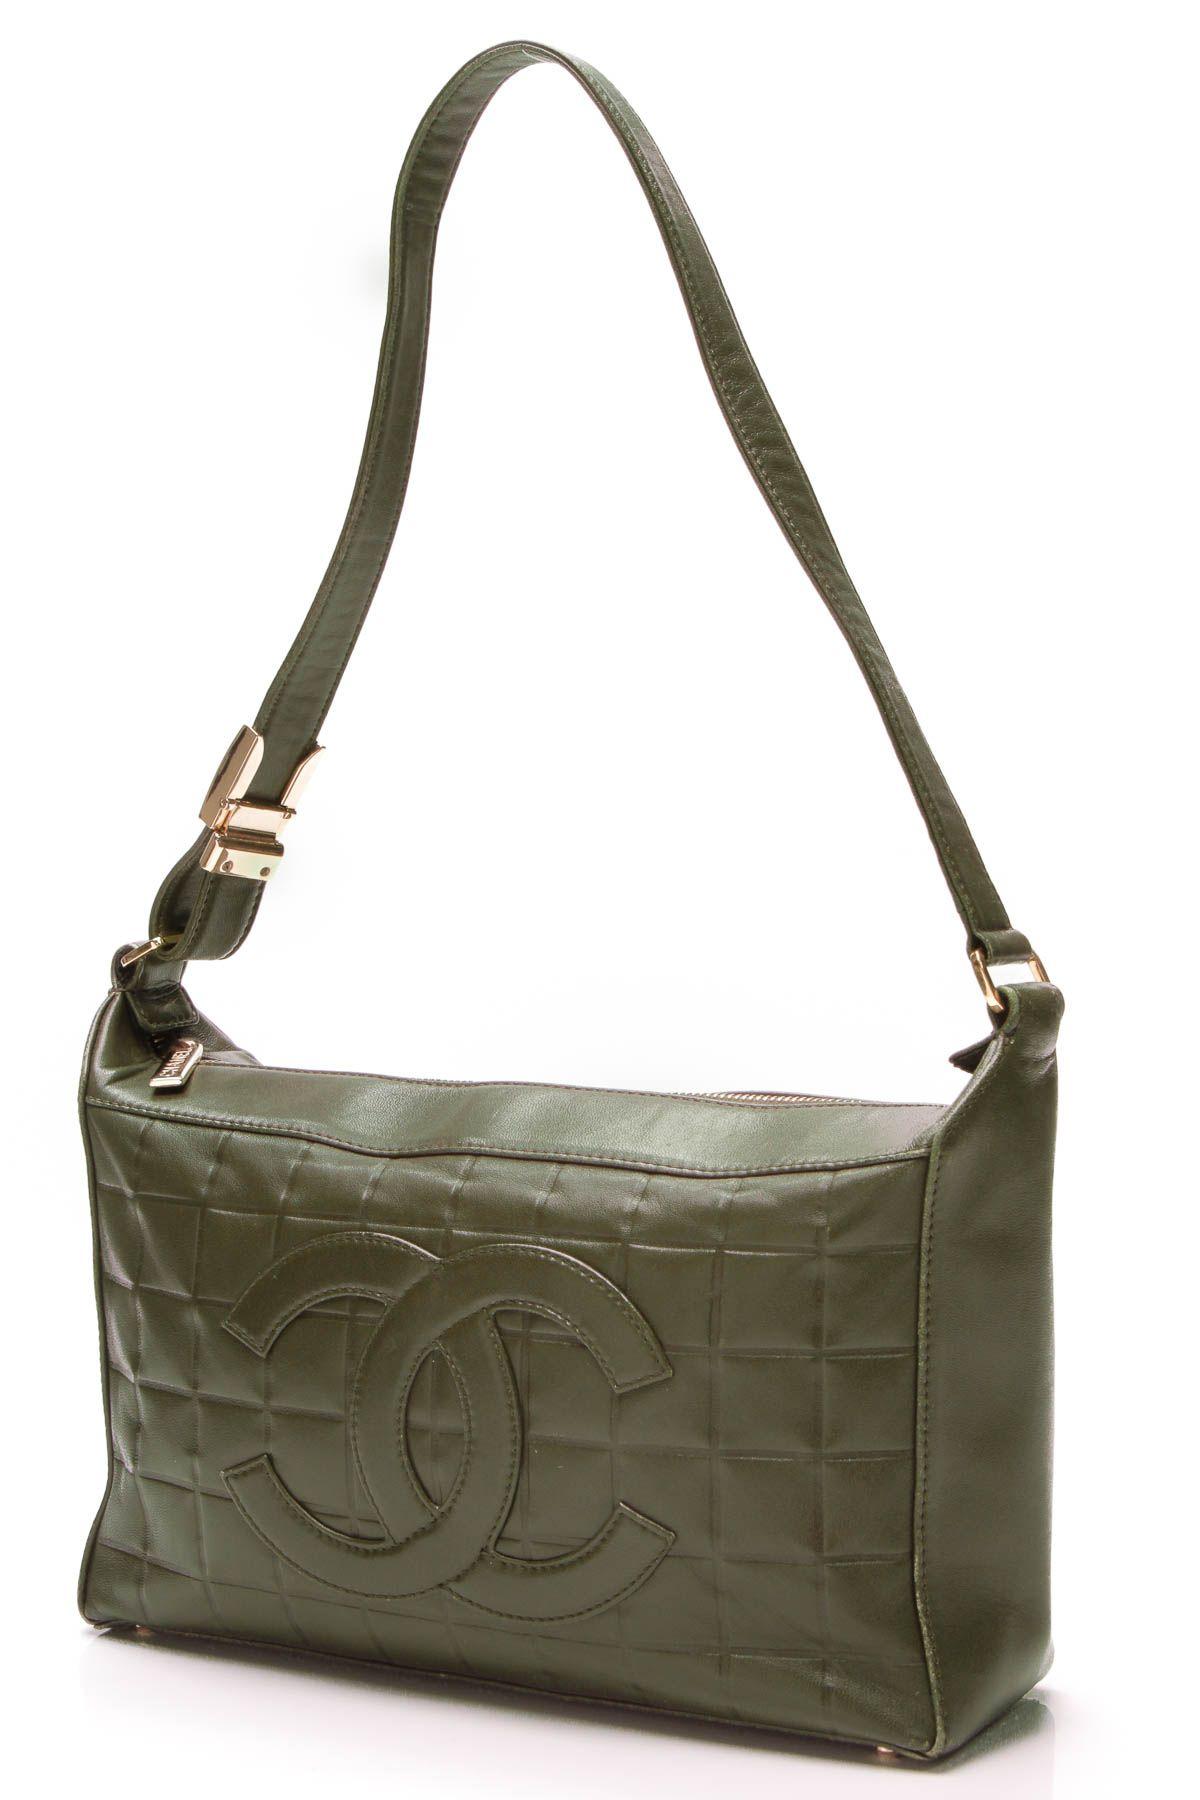 7503ab769779 Chanel Chocolate Bar Shoulder Bag - Olive Green Lambskin